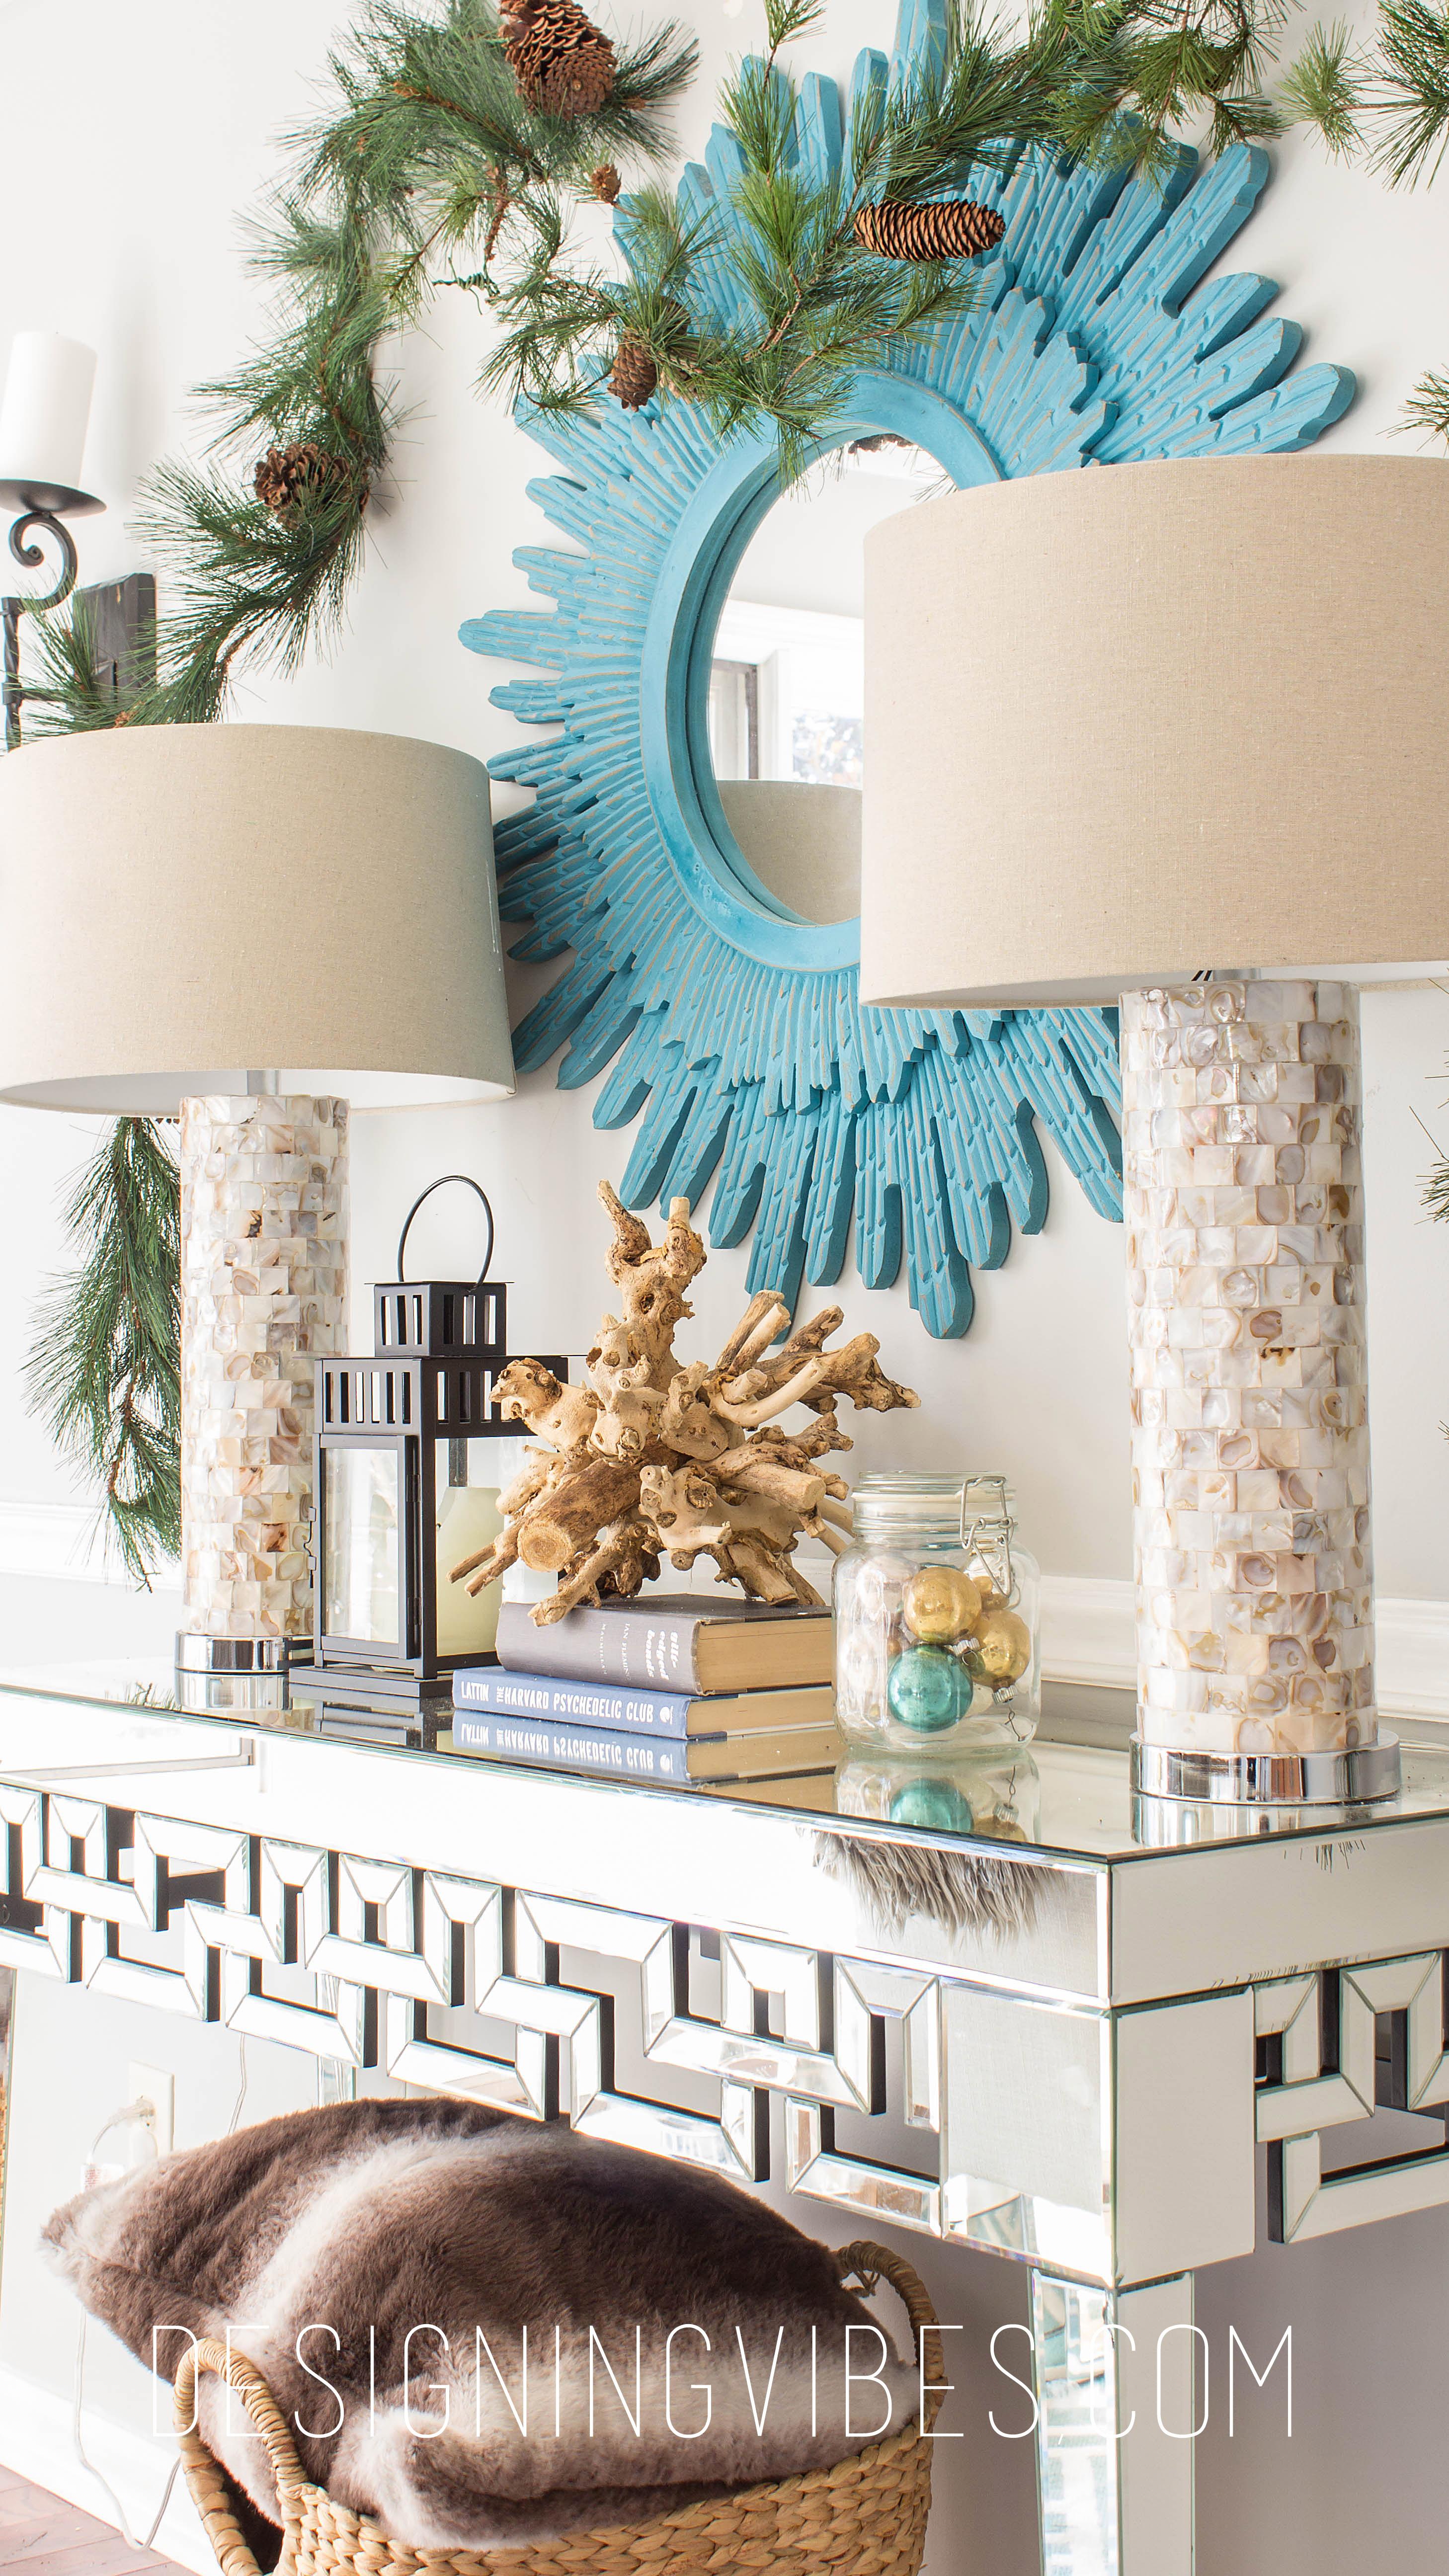 interior design blogger decoration home decor fashion forward glam